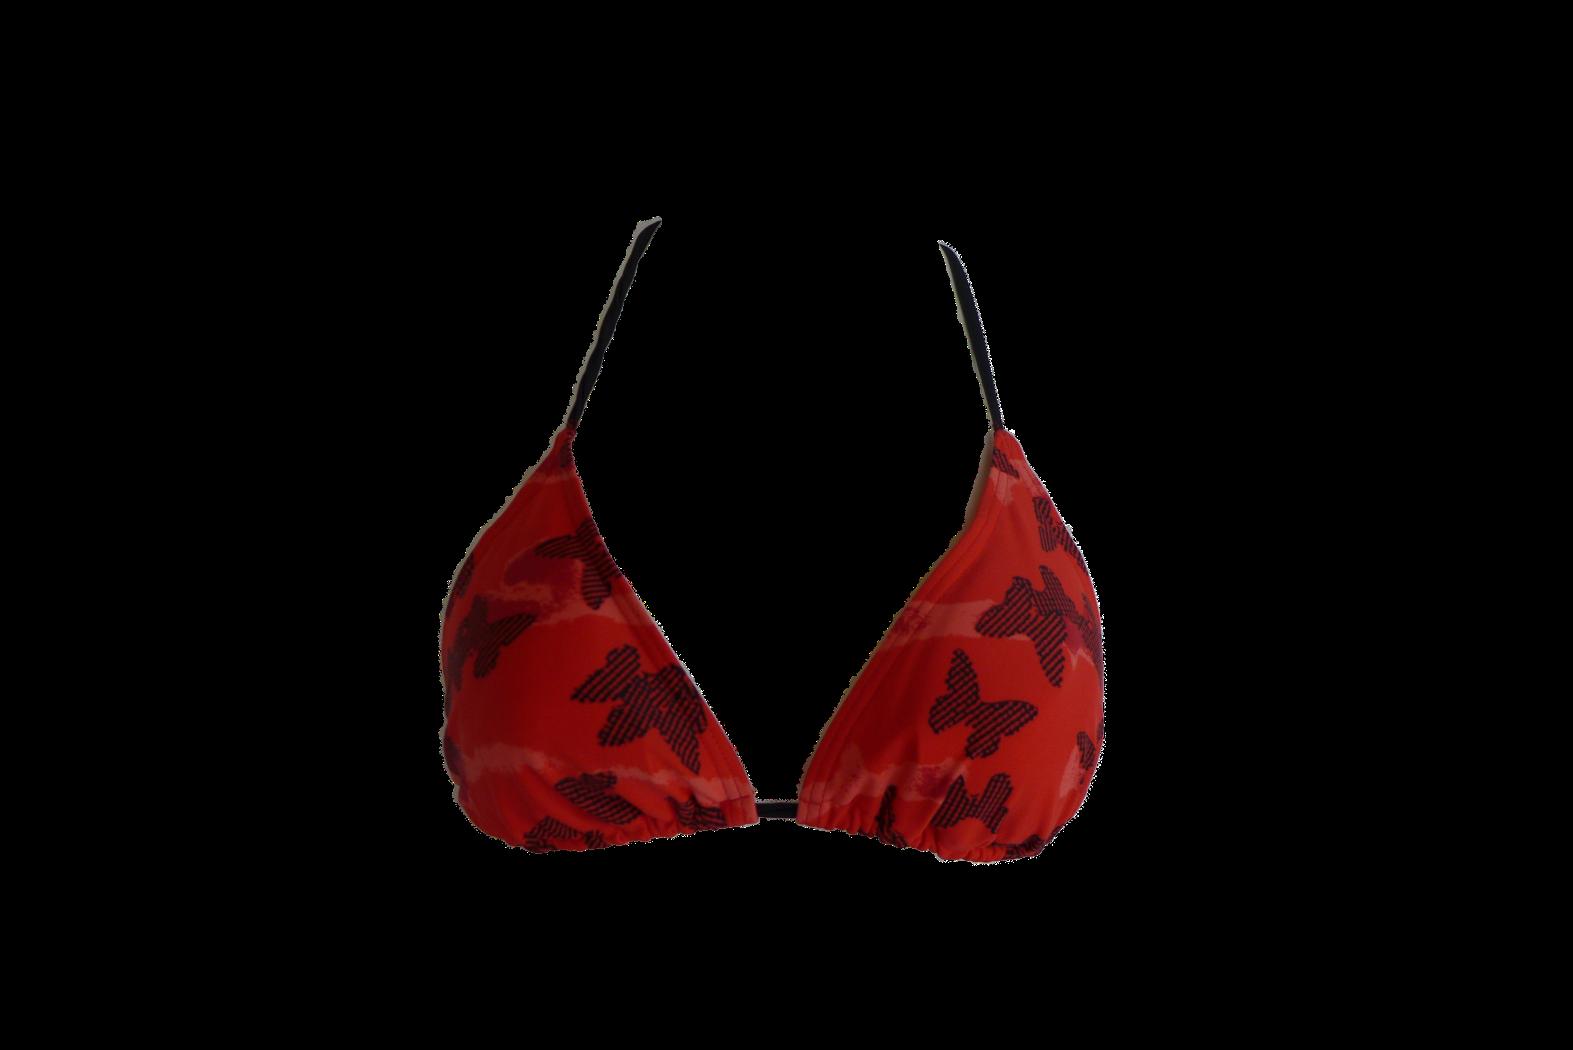 Damen Triangel Bikini Oberteil Rot/Schwarz Gr. 38 40 42 44 NEU